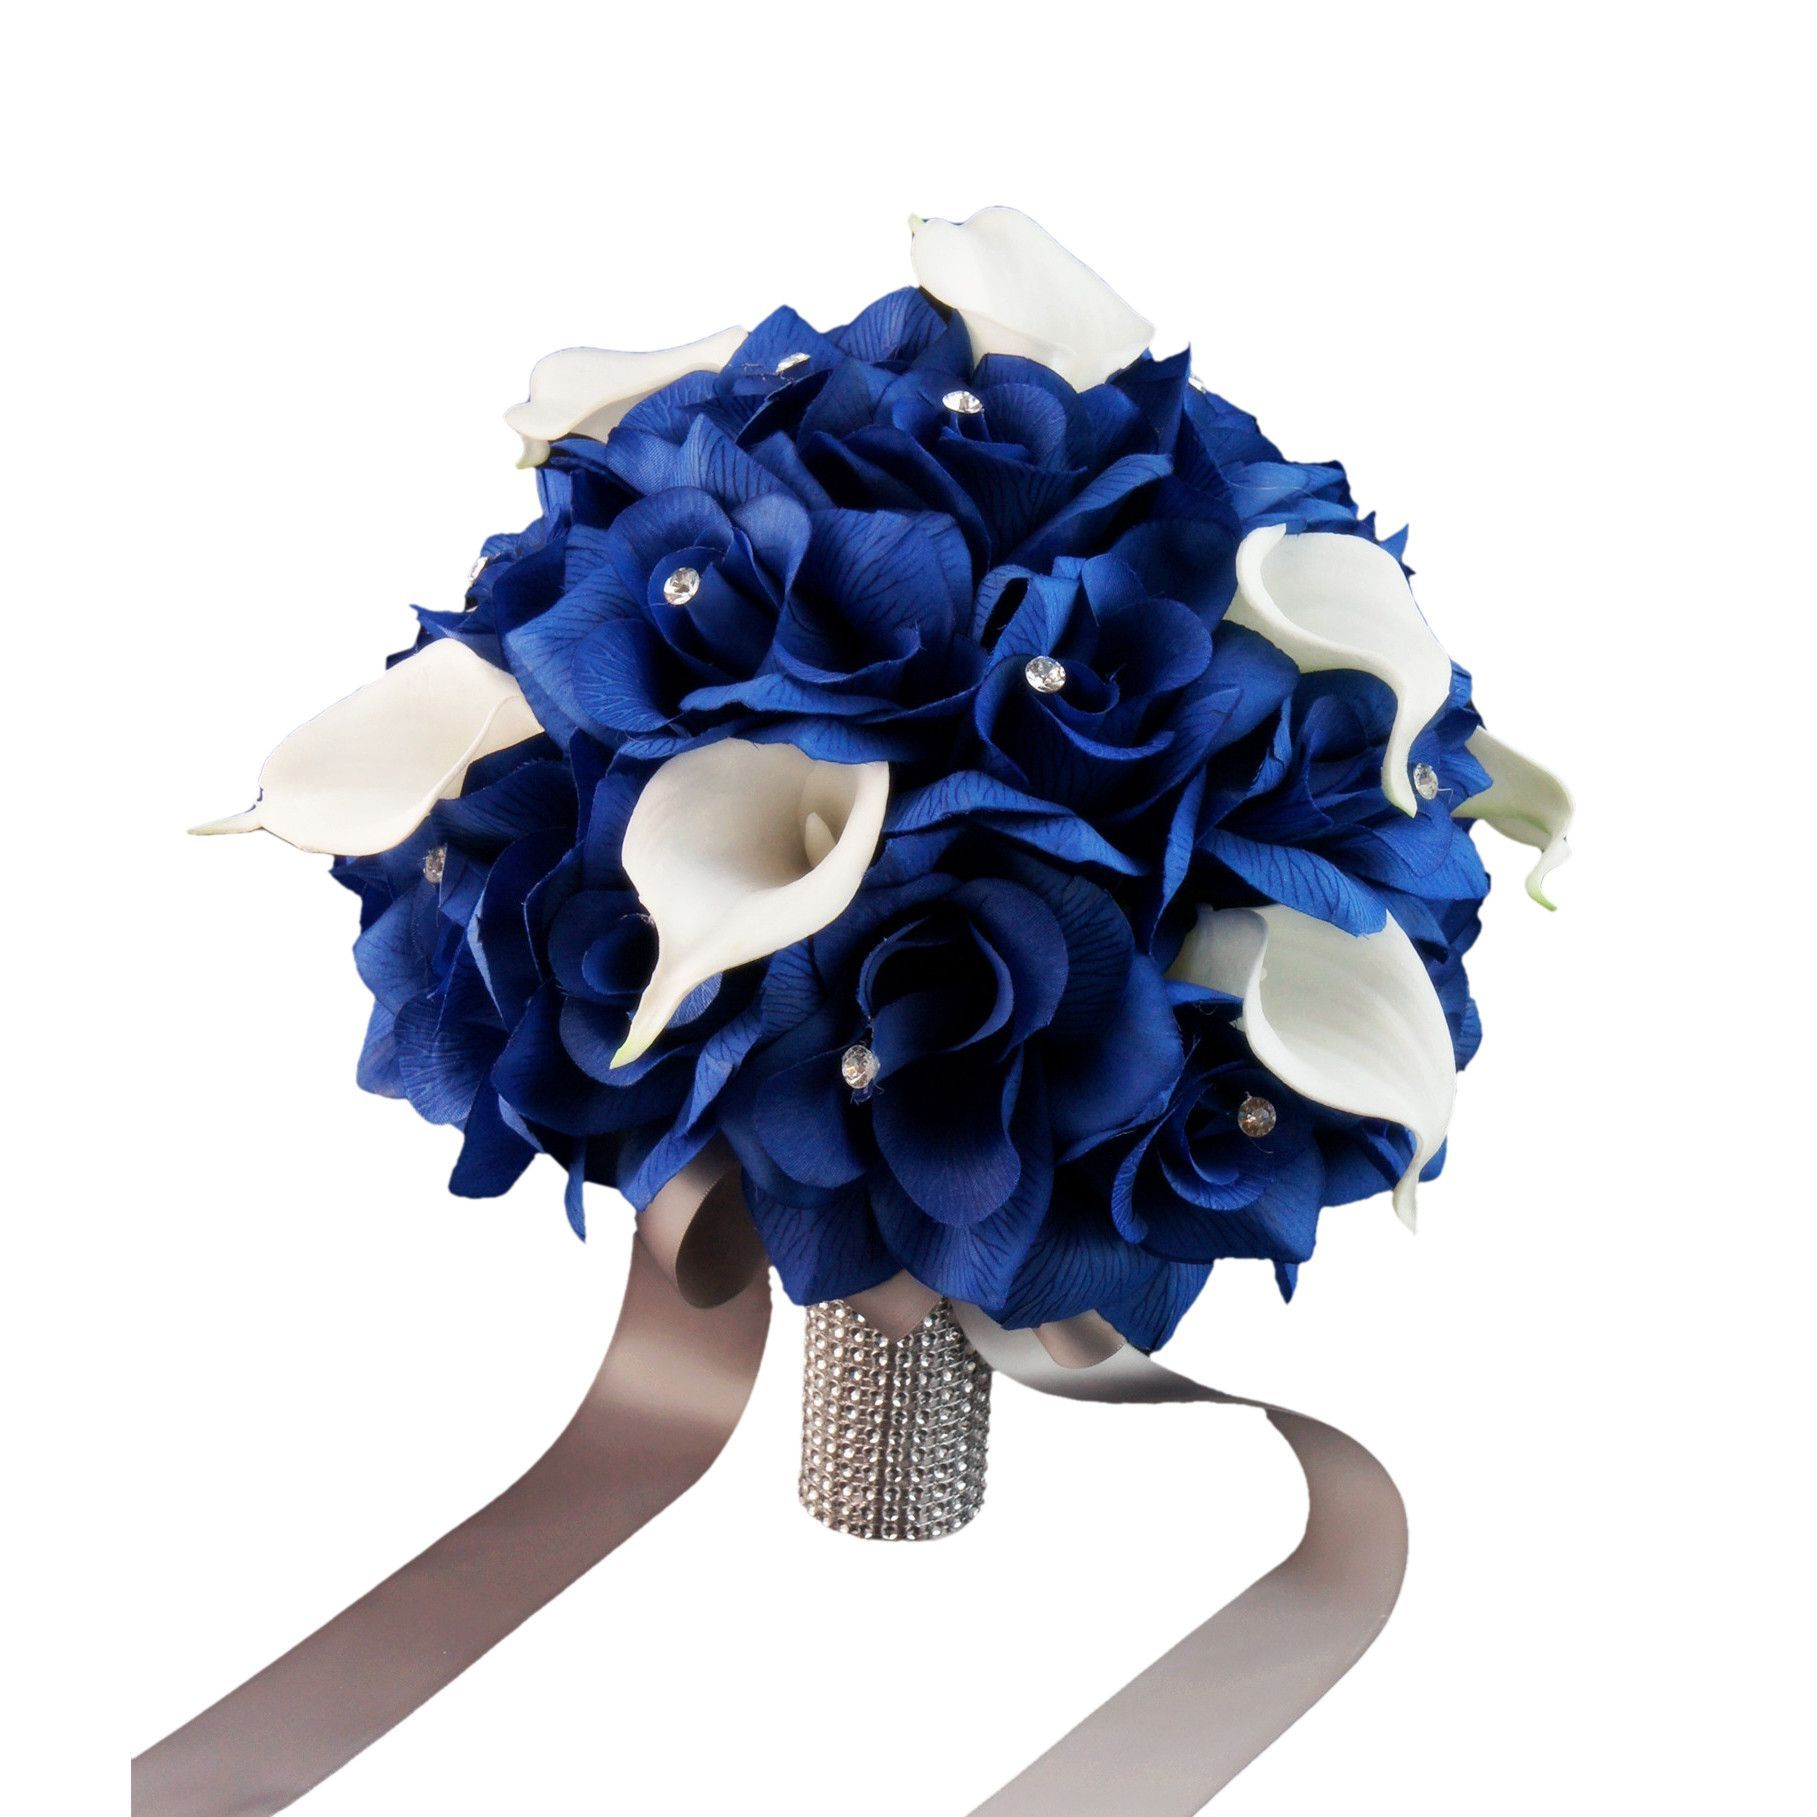 10 Bouquet Horizon Royal Blue With White Calla Lily Artificial Wedding